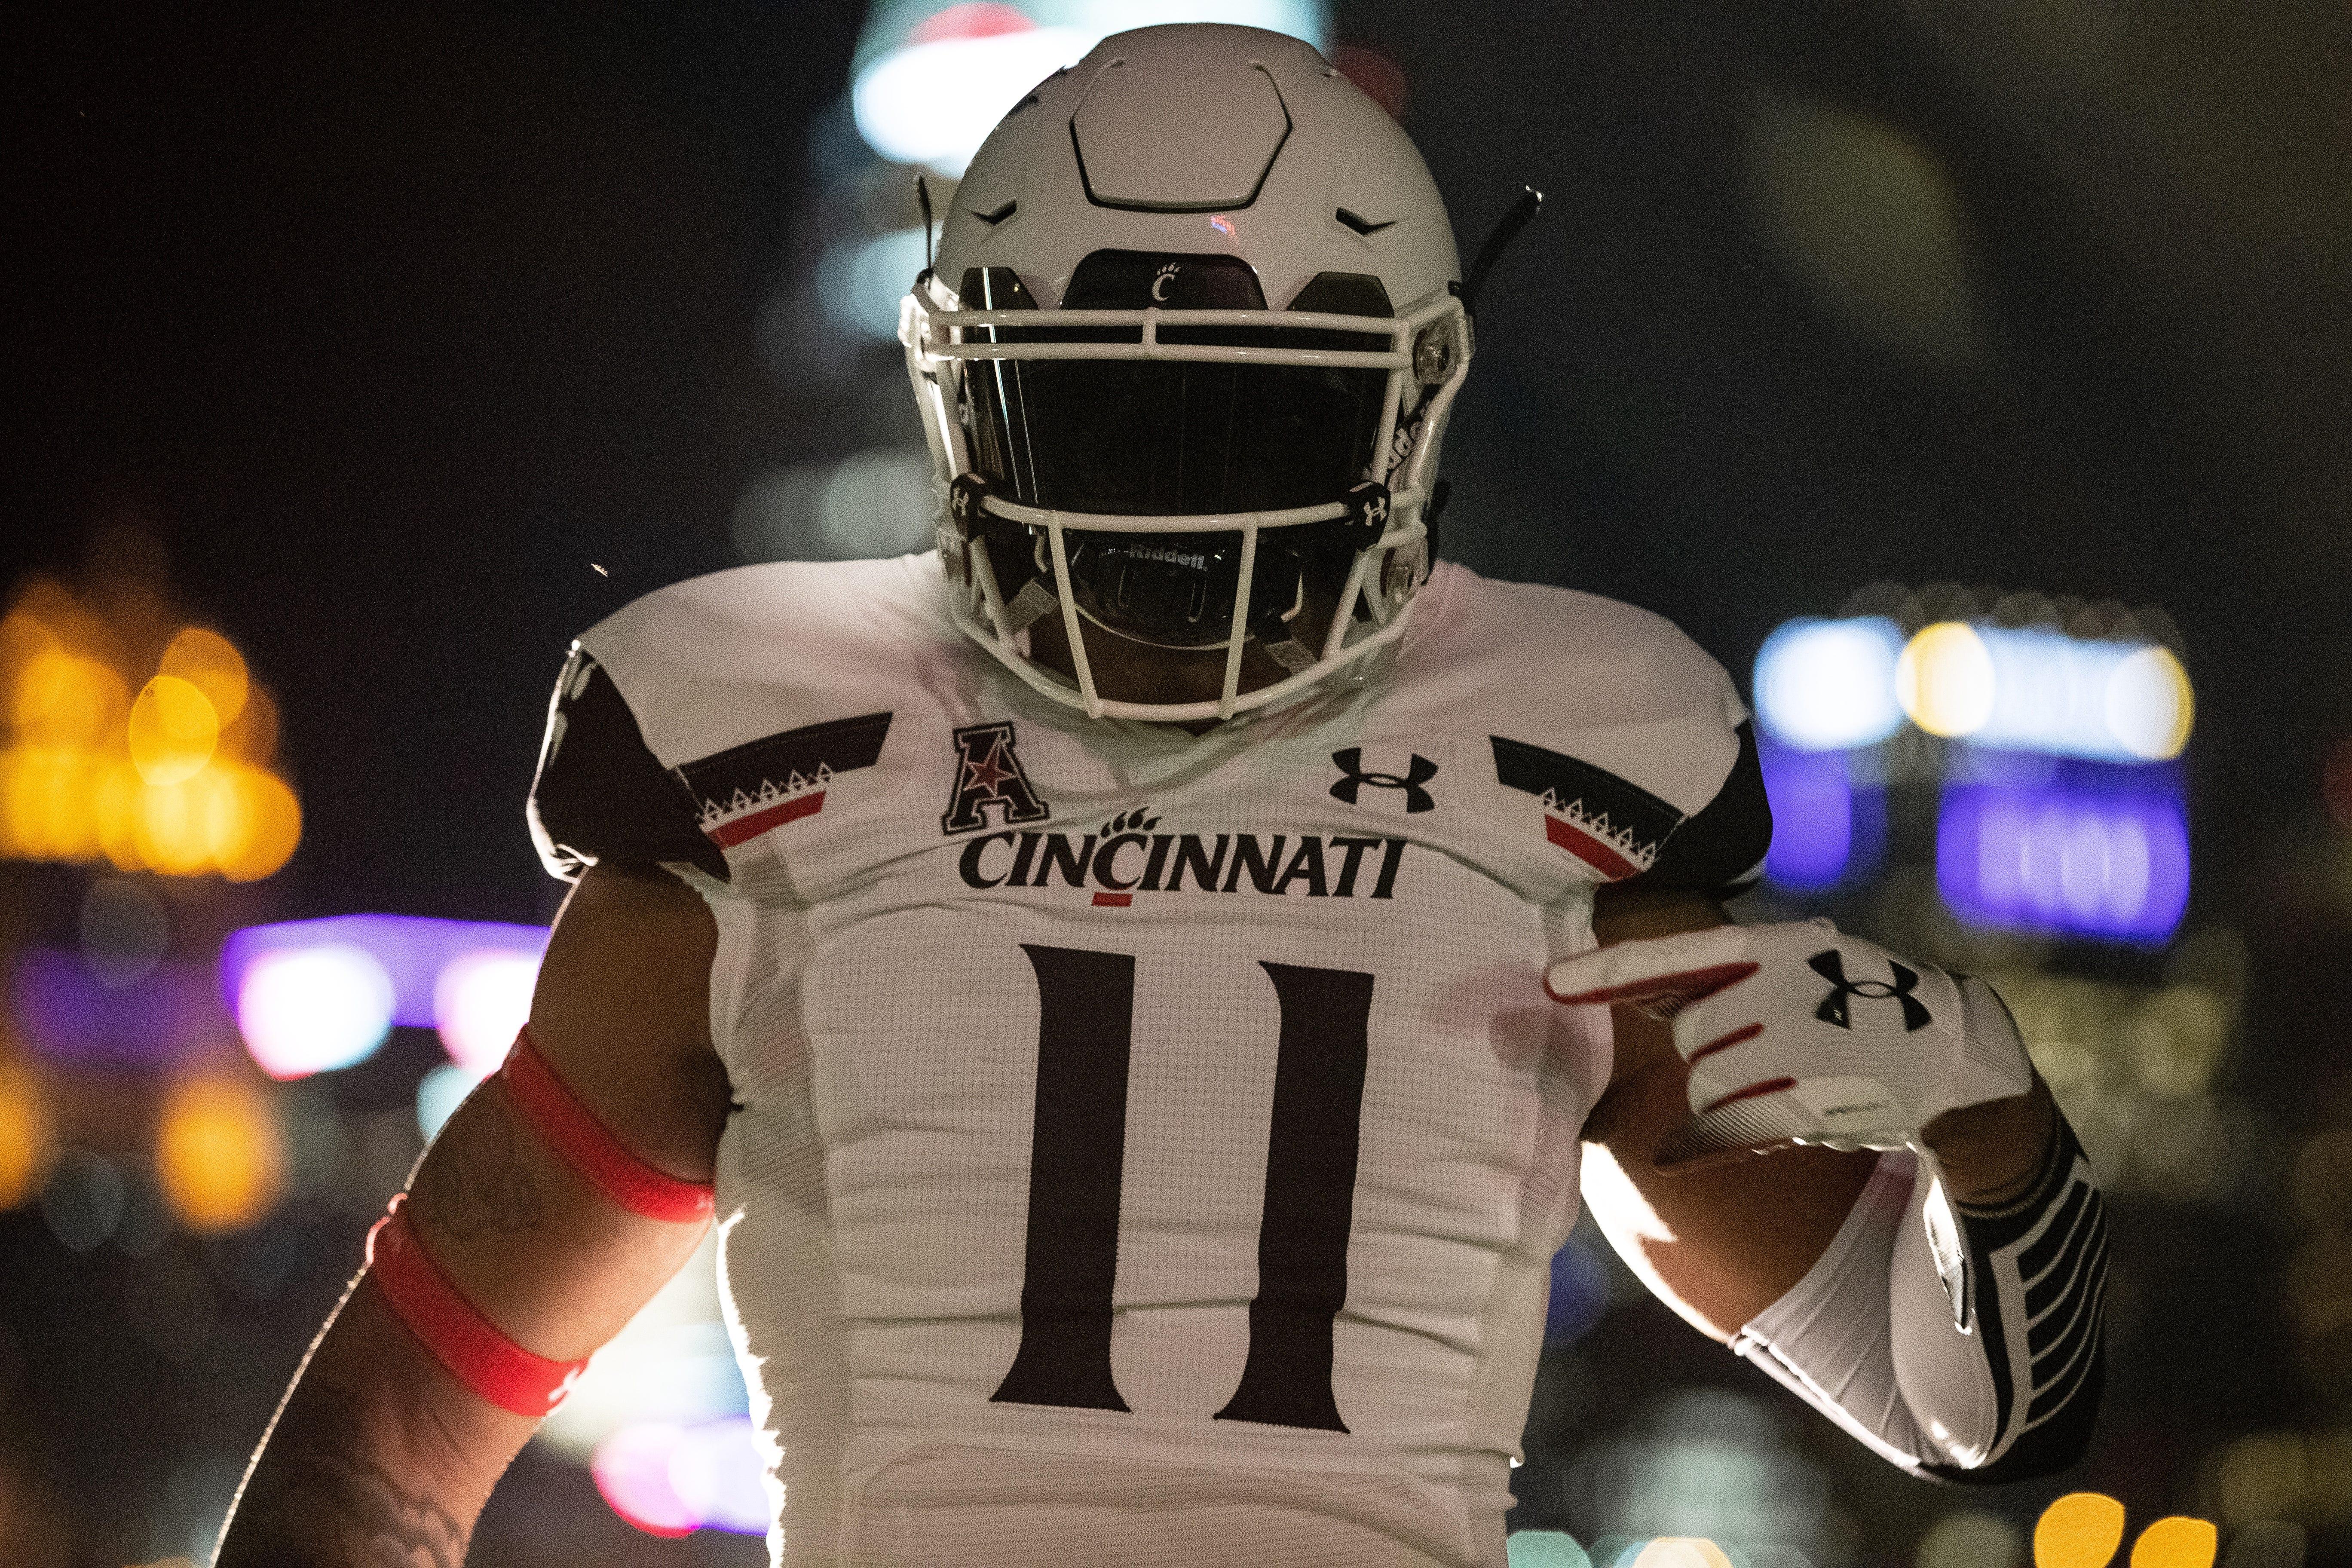 New University Of Cincinnati Football Uniforms Unveiled